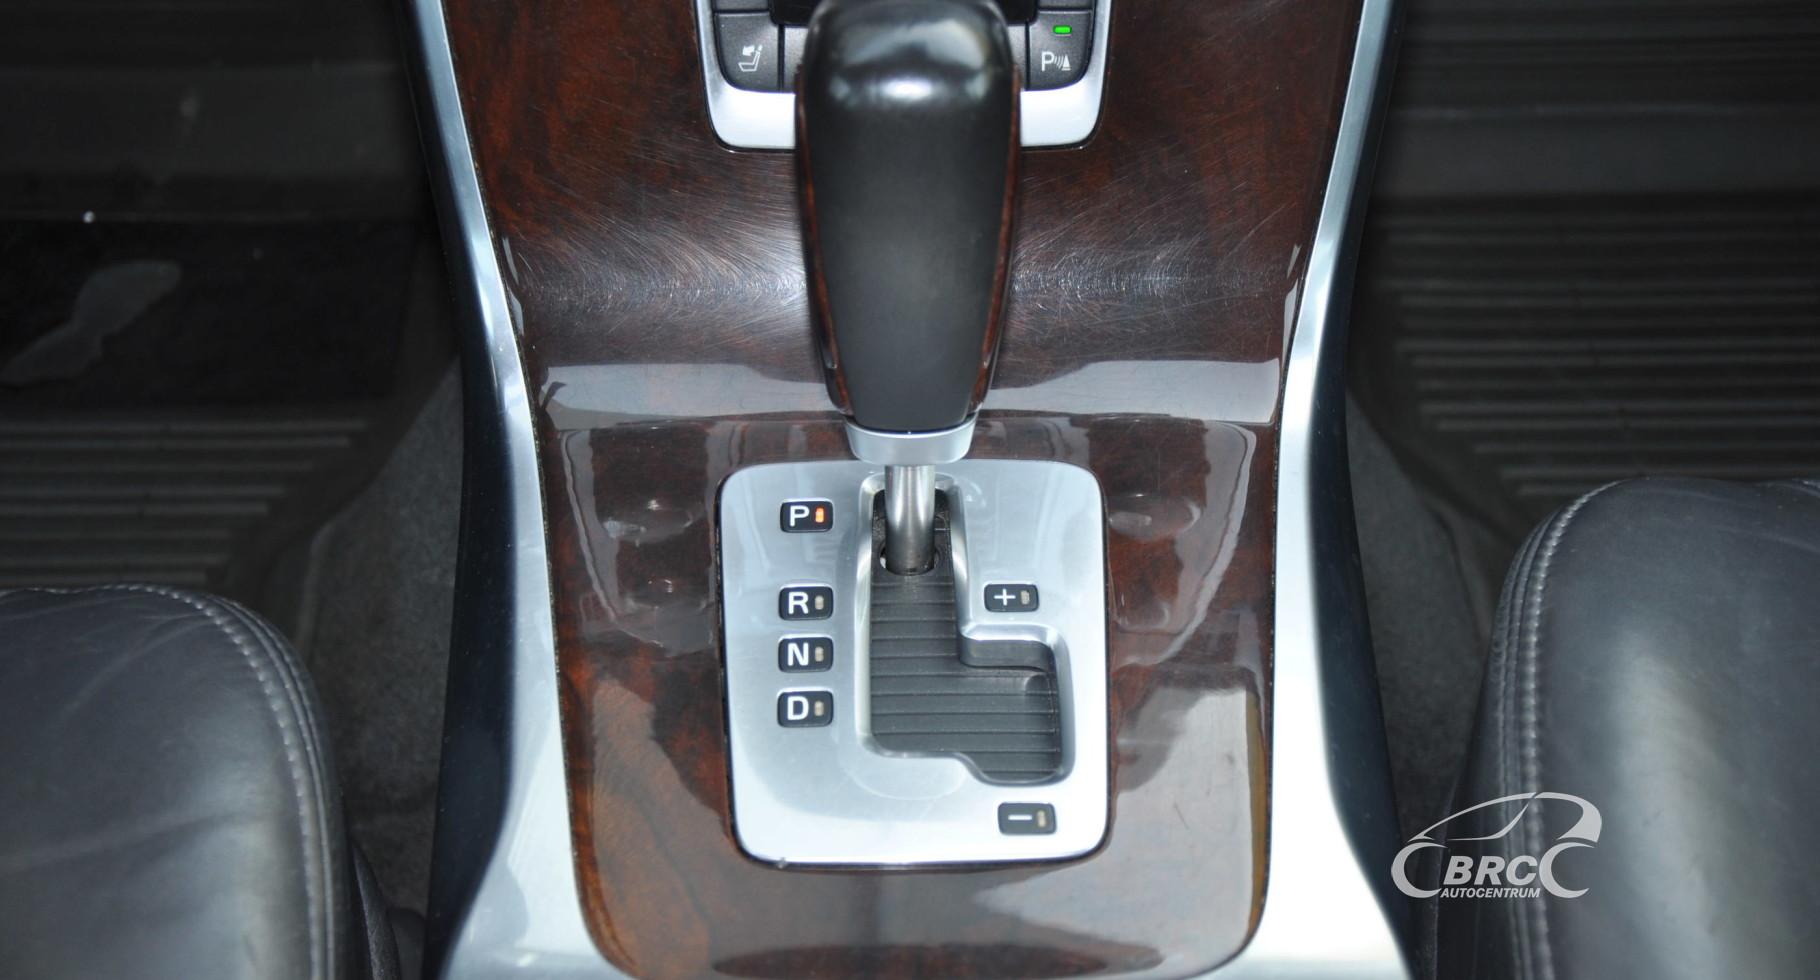 Volvo V70 1.6 DRIVe Automatas